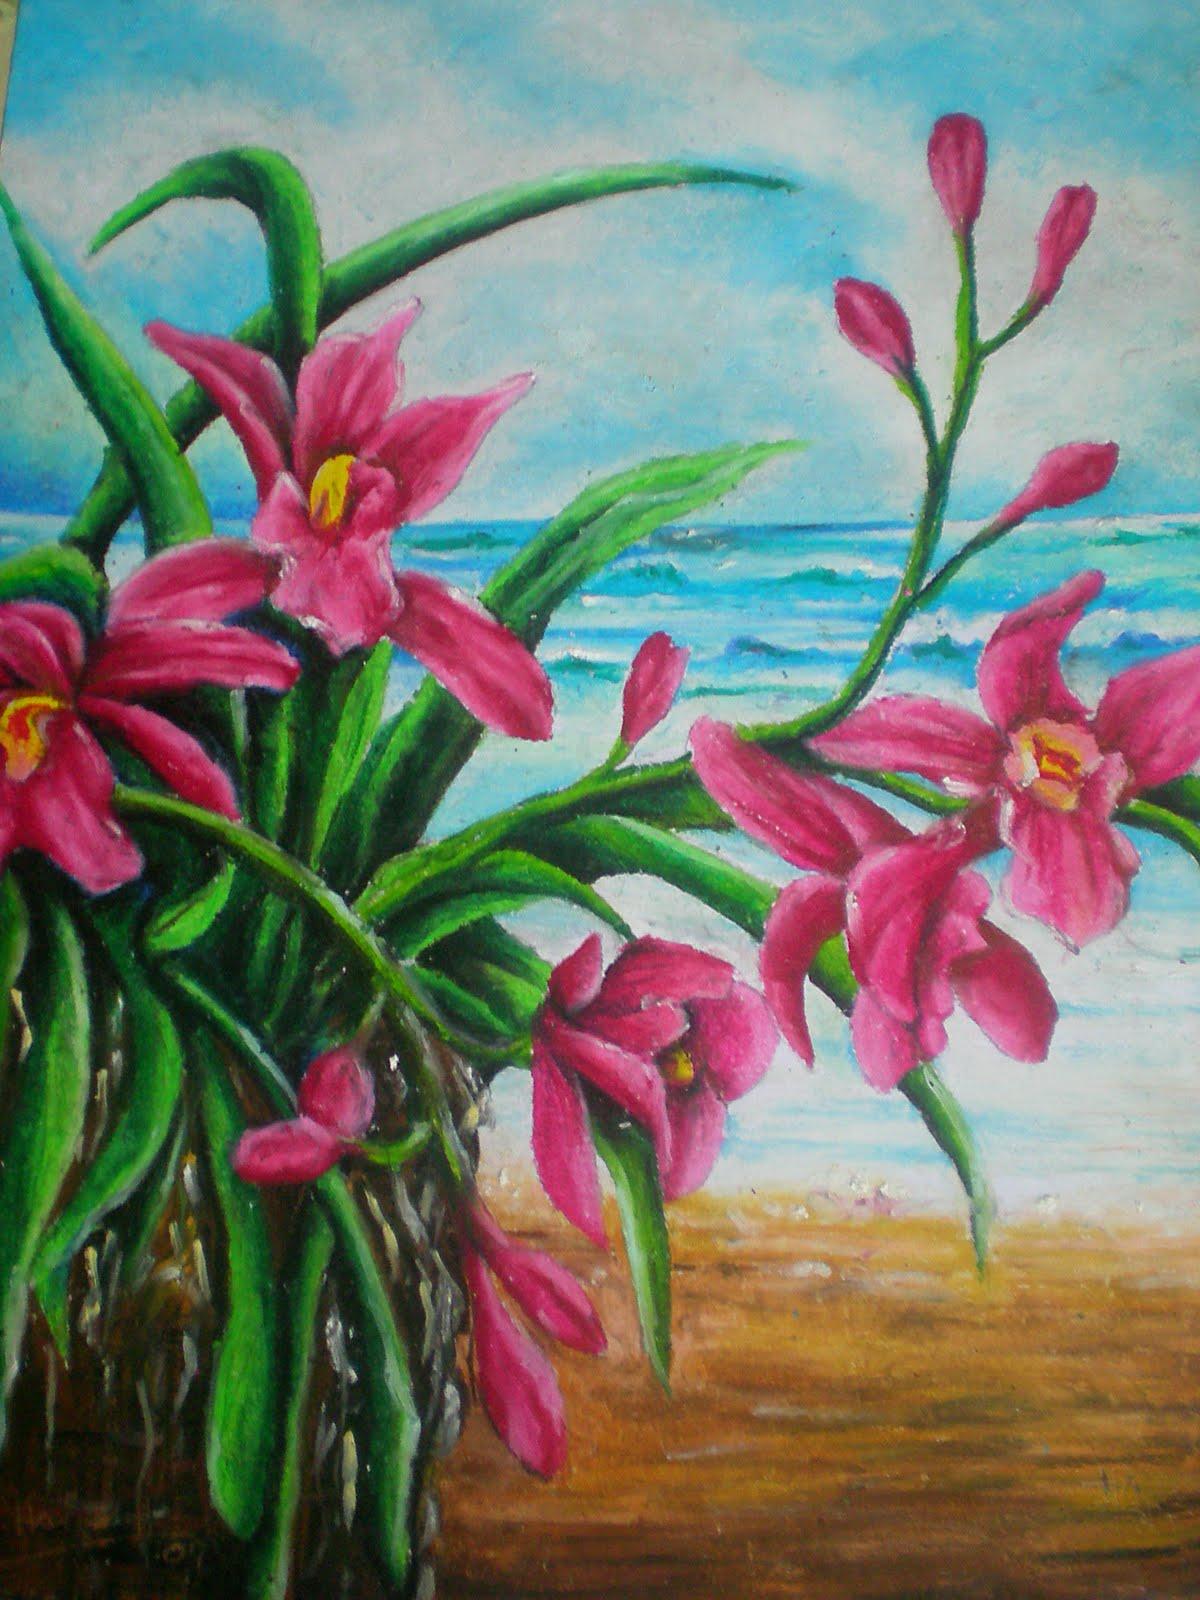 Contoh 3 (oil pastels) - soalan 1.....